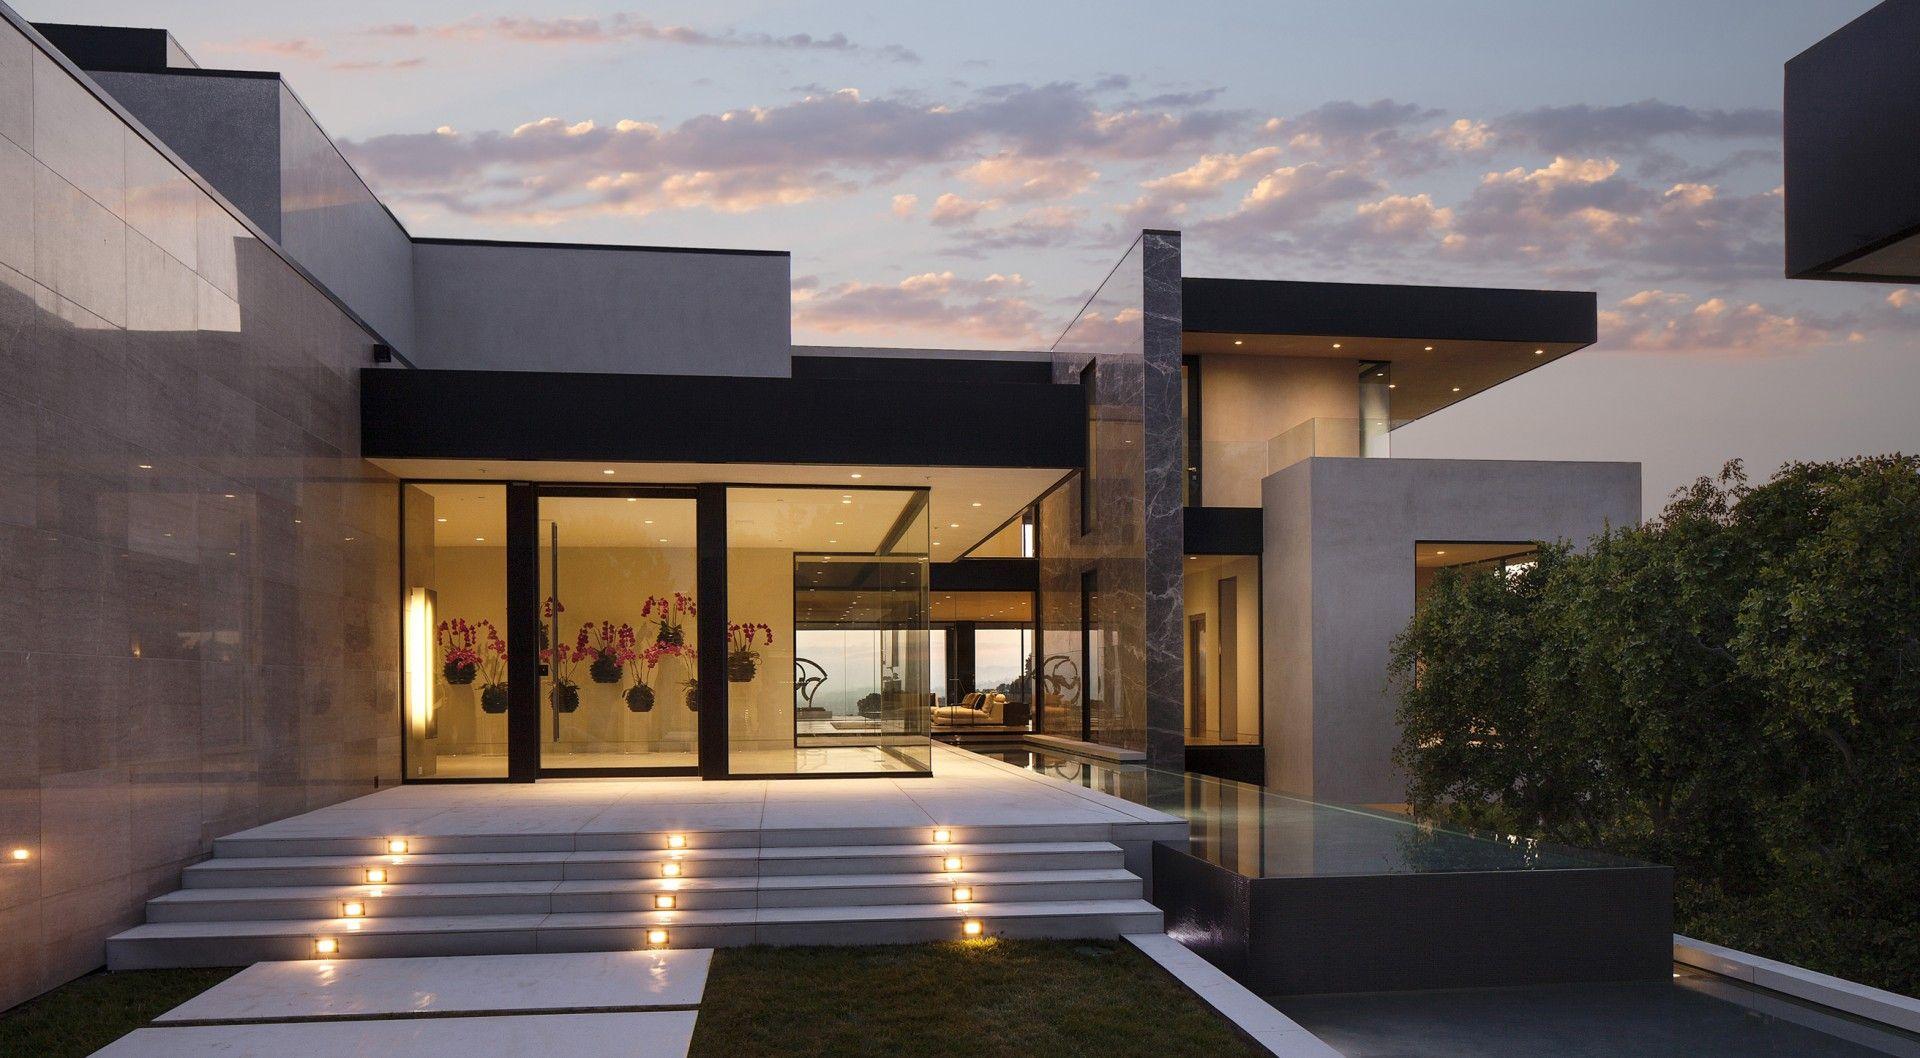 los angeles laguna beach architektur projekte mcclean design architecture and interior. Black Bedroom Furniture Sets. Home Design Ideas